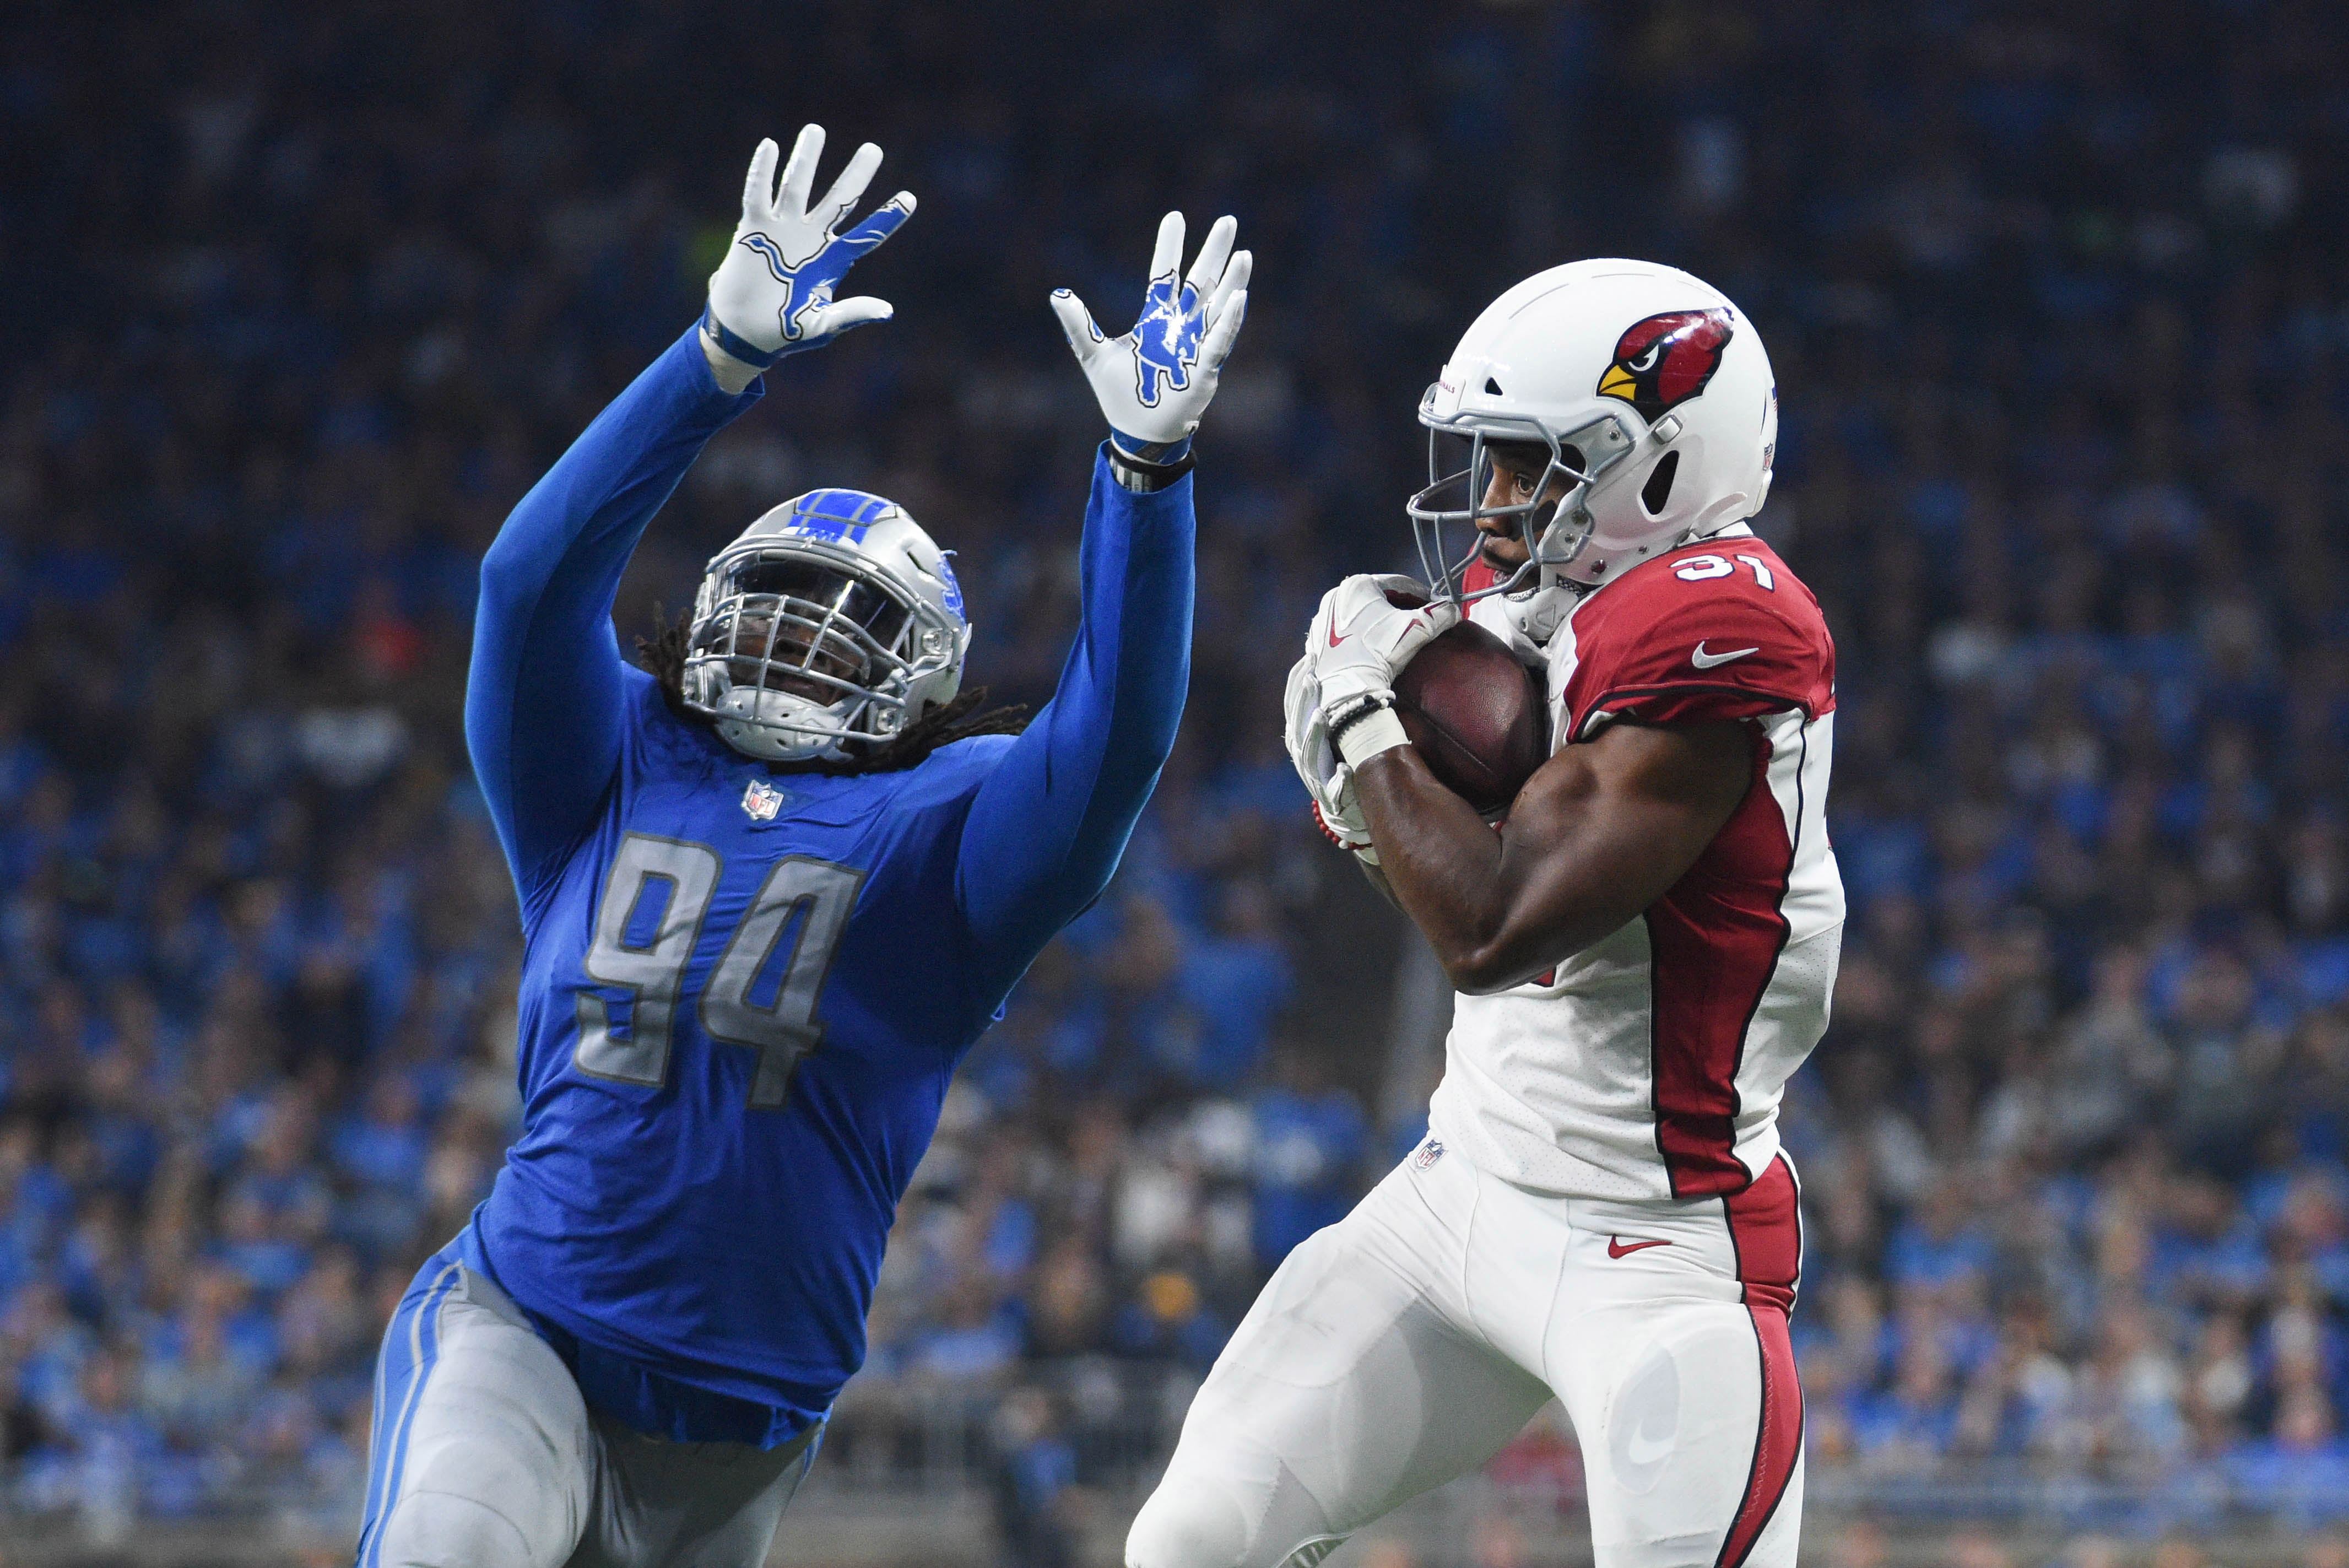 NFL: Arizona Cardinals at Detroit Lions